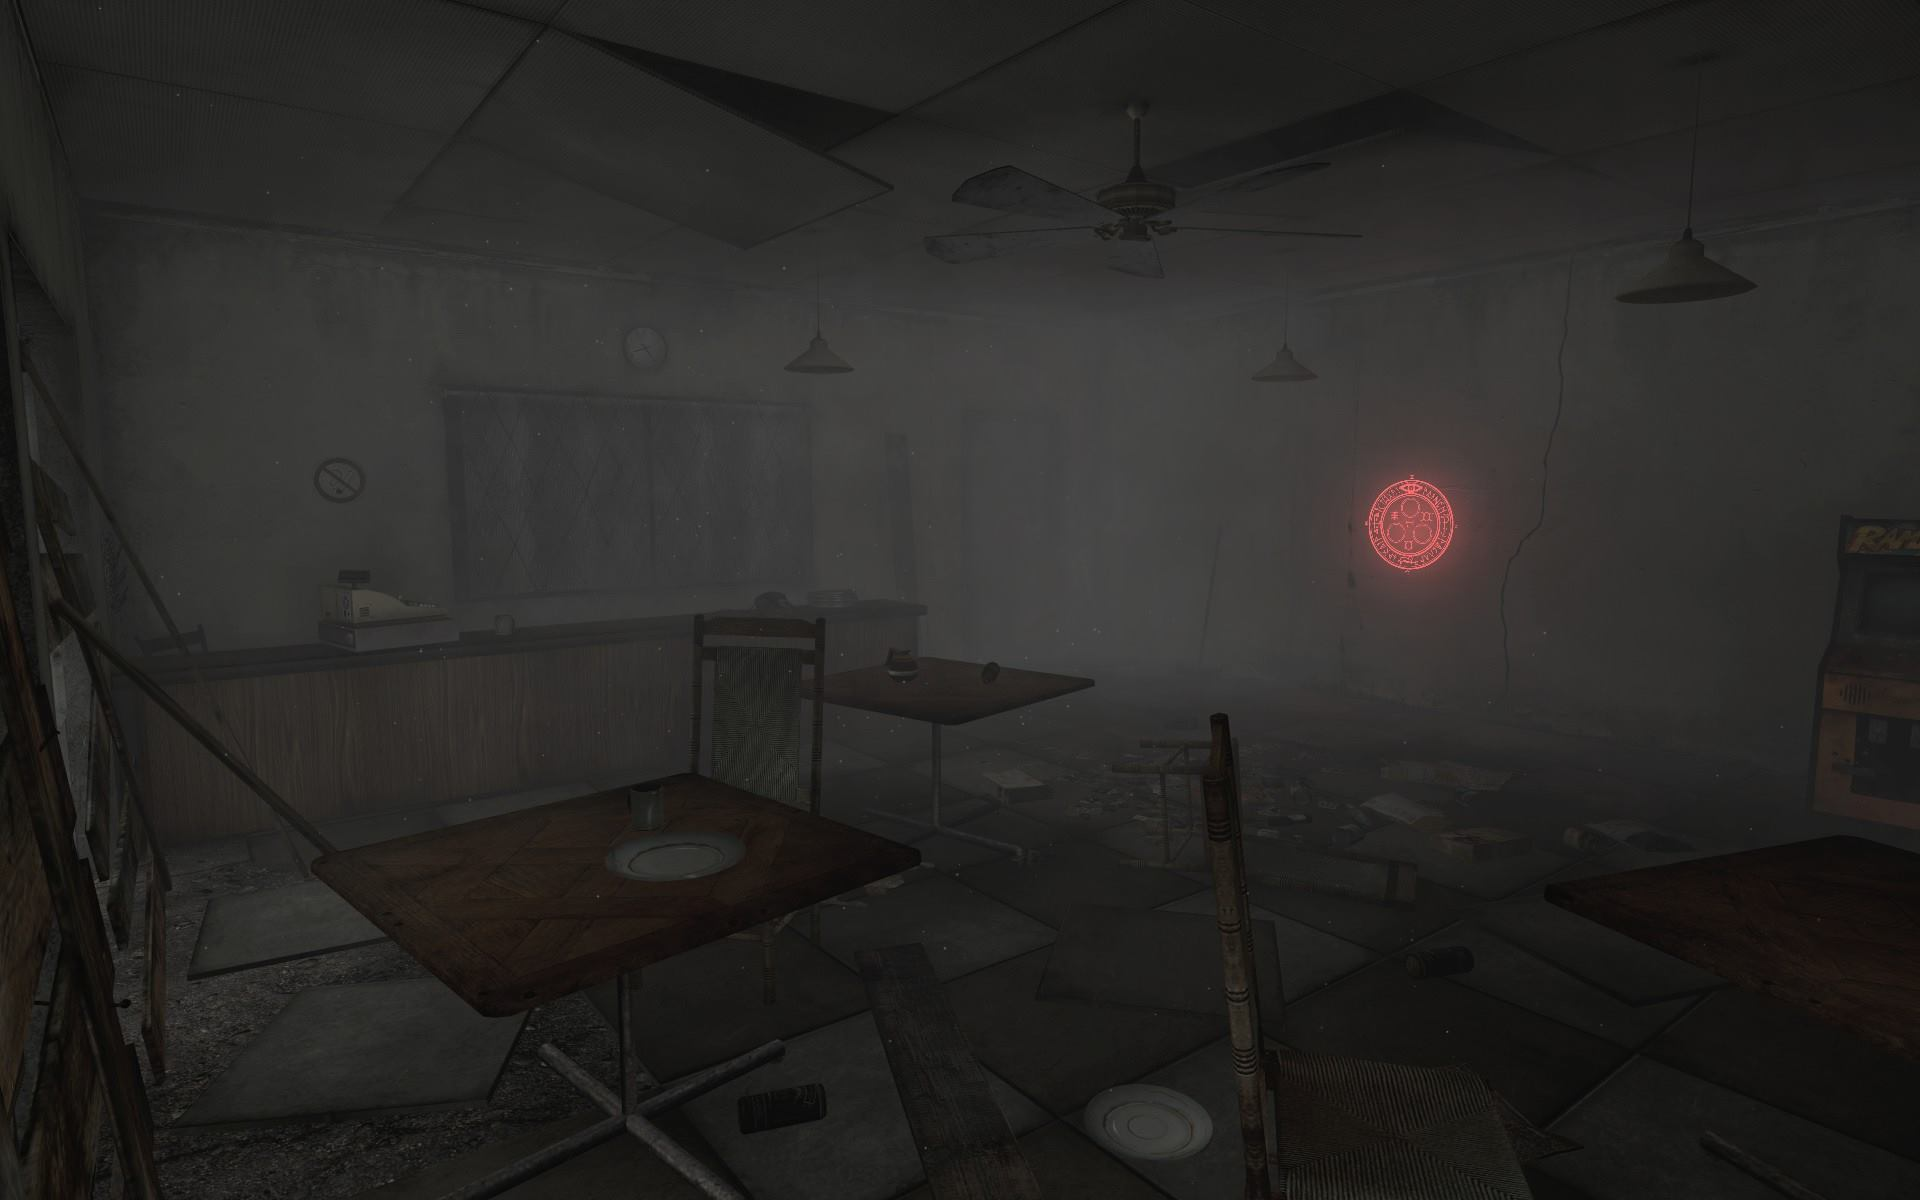 игры gfwl в steam